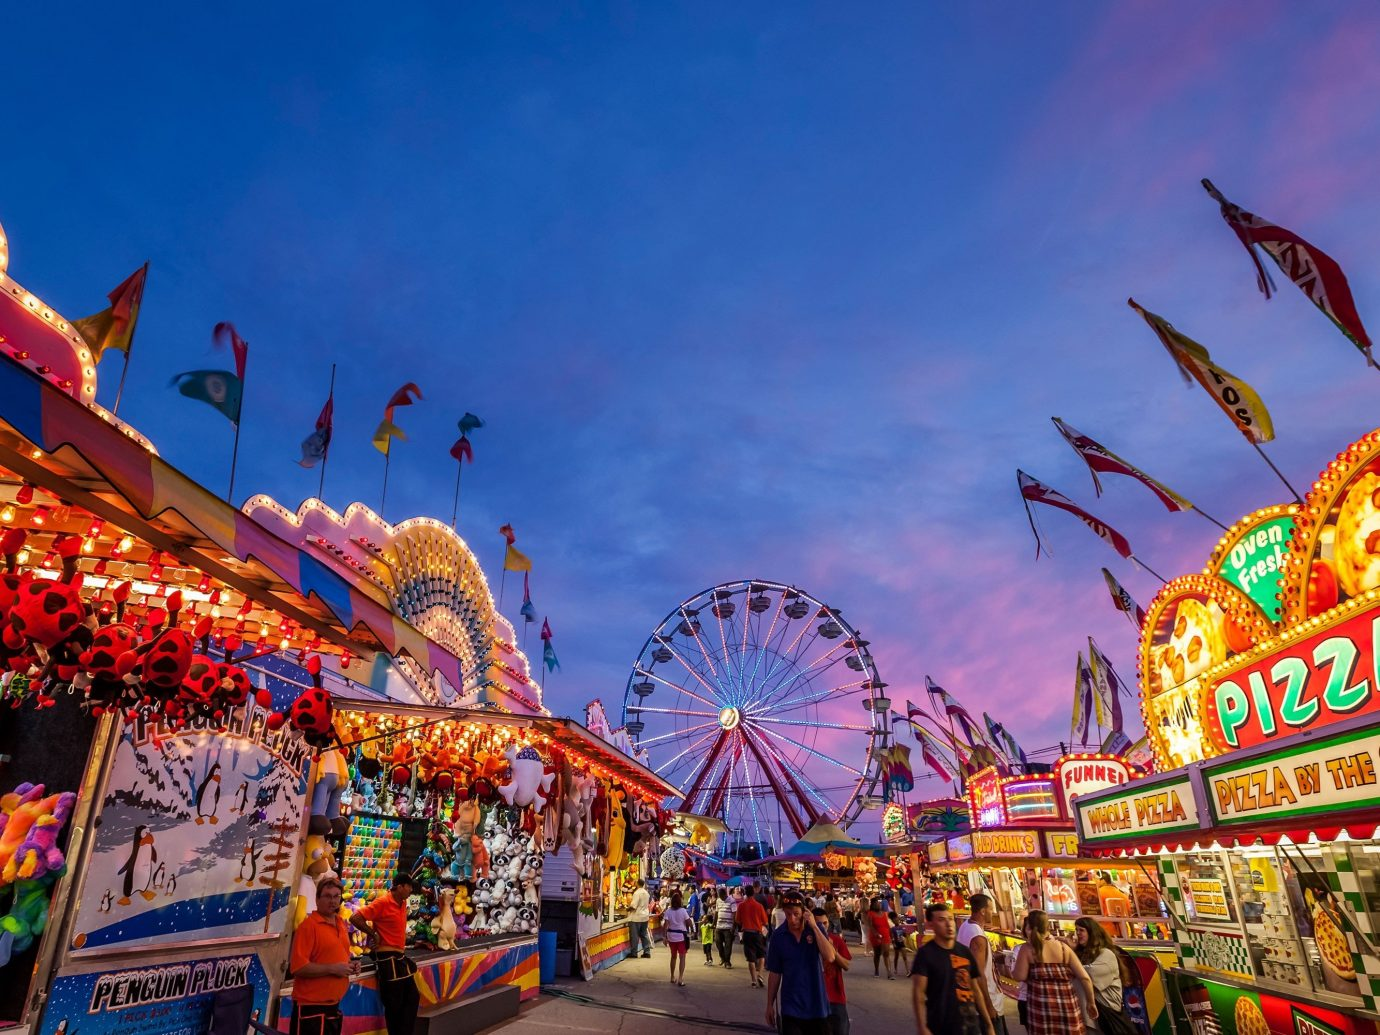 Offbeat sky outdoor ride crowd amusement park fair festival park amusement ride cityscape ferris wheel colorful roller coaster place of worship temple colored